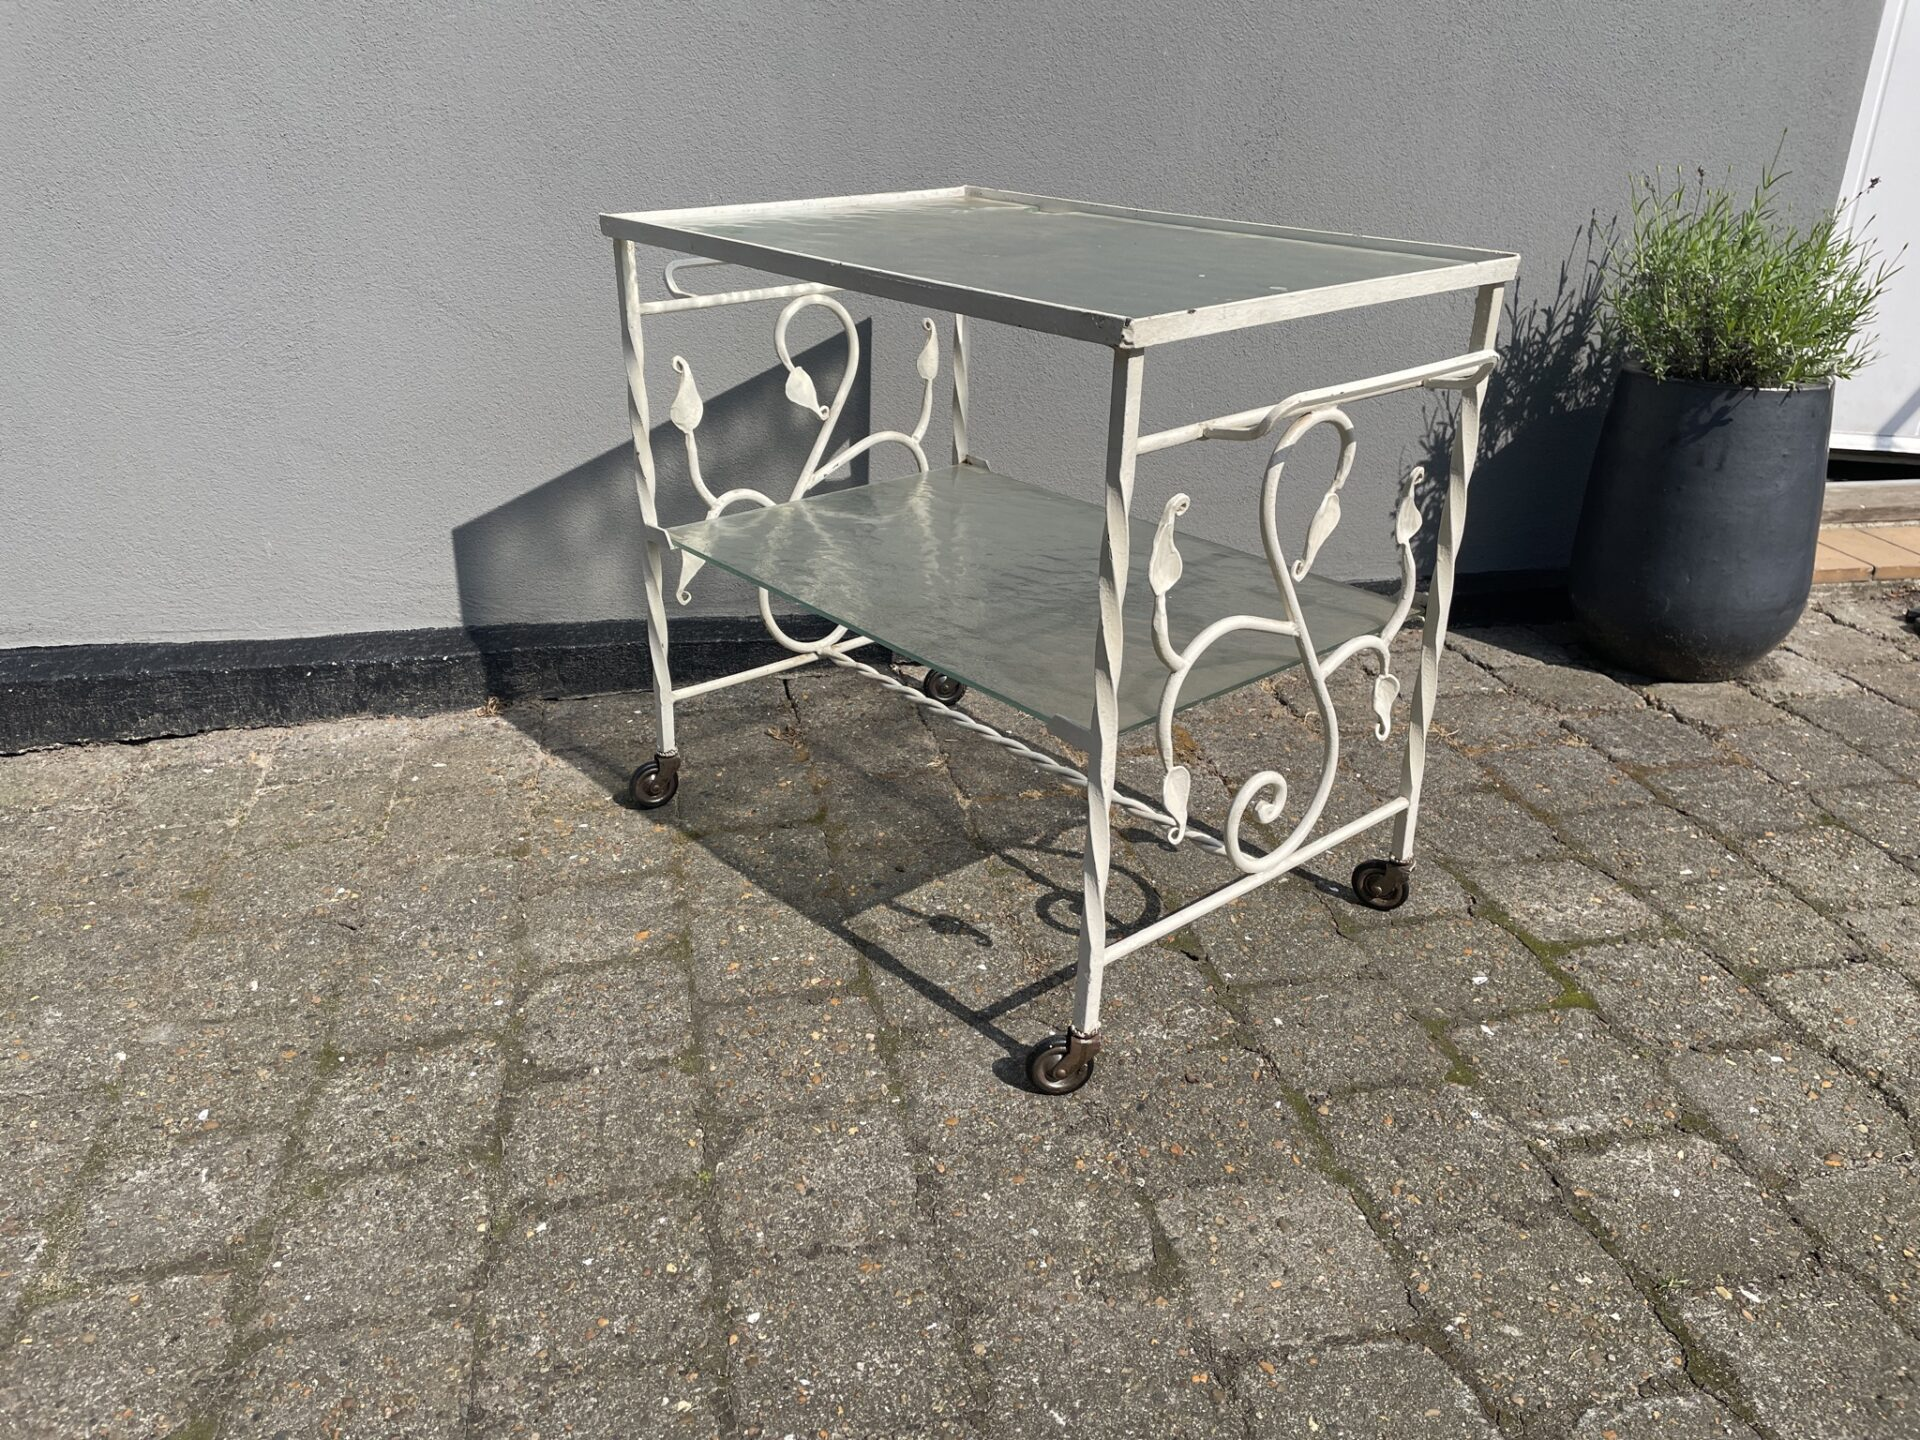 Retro blomsterbord/barbord  på hjul, 60x40 cm, h= 58 cm, pris 800kr